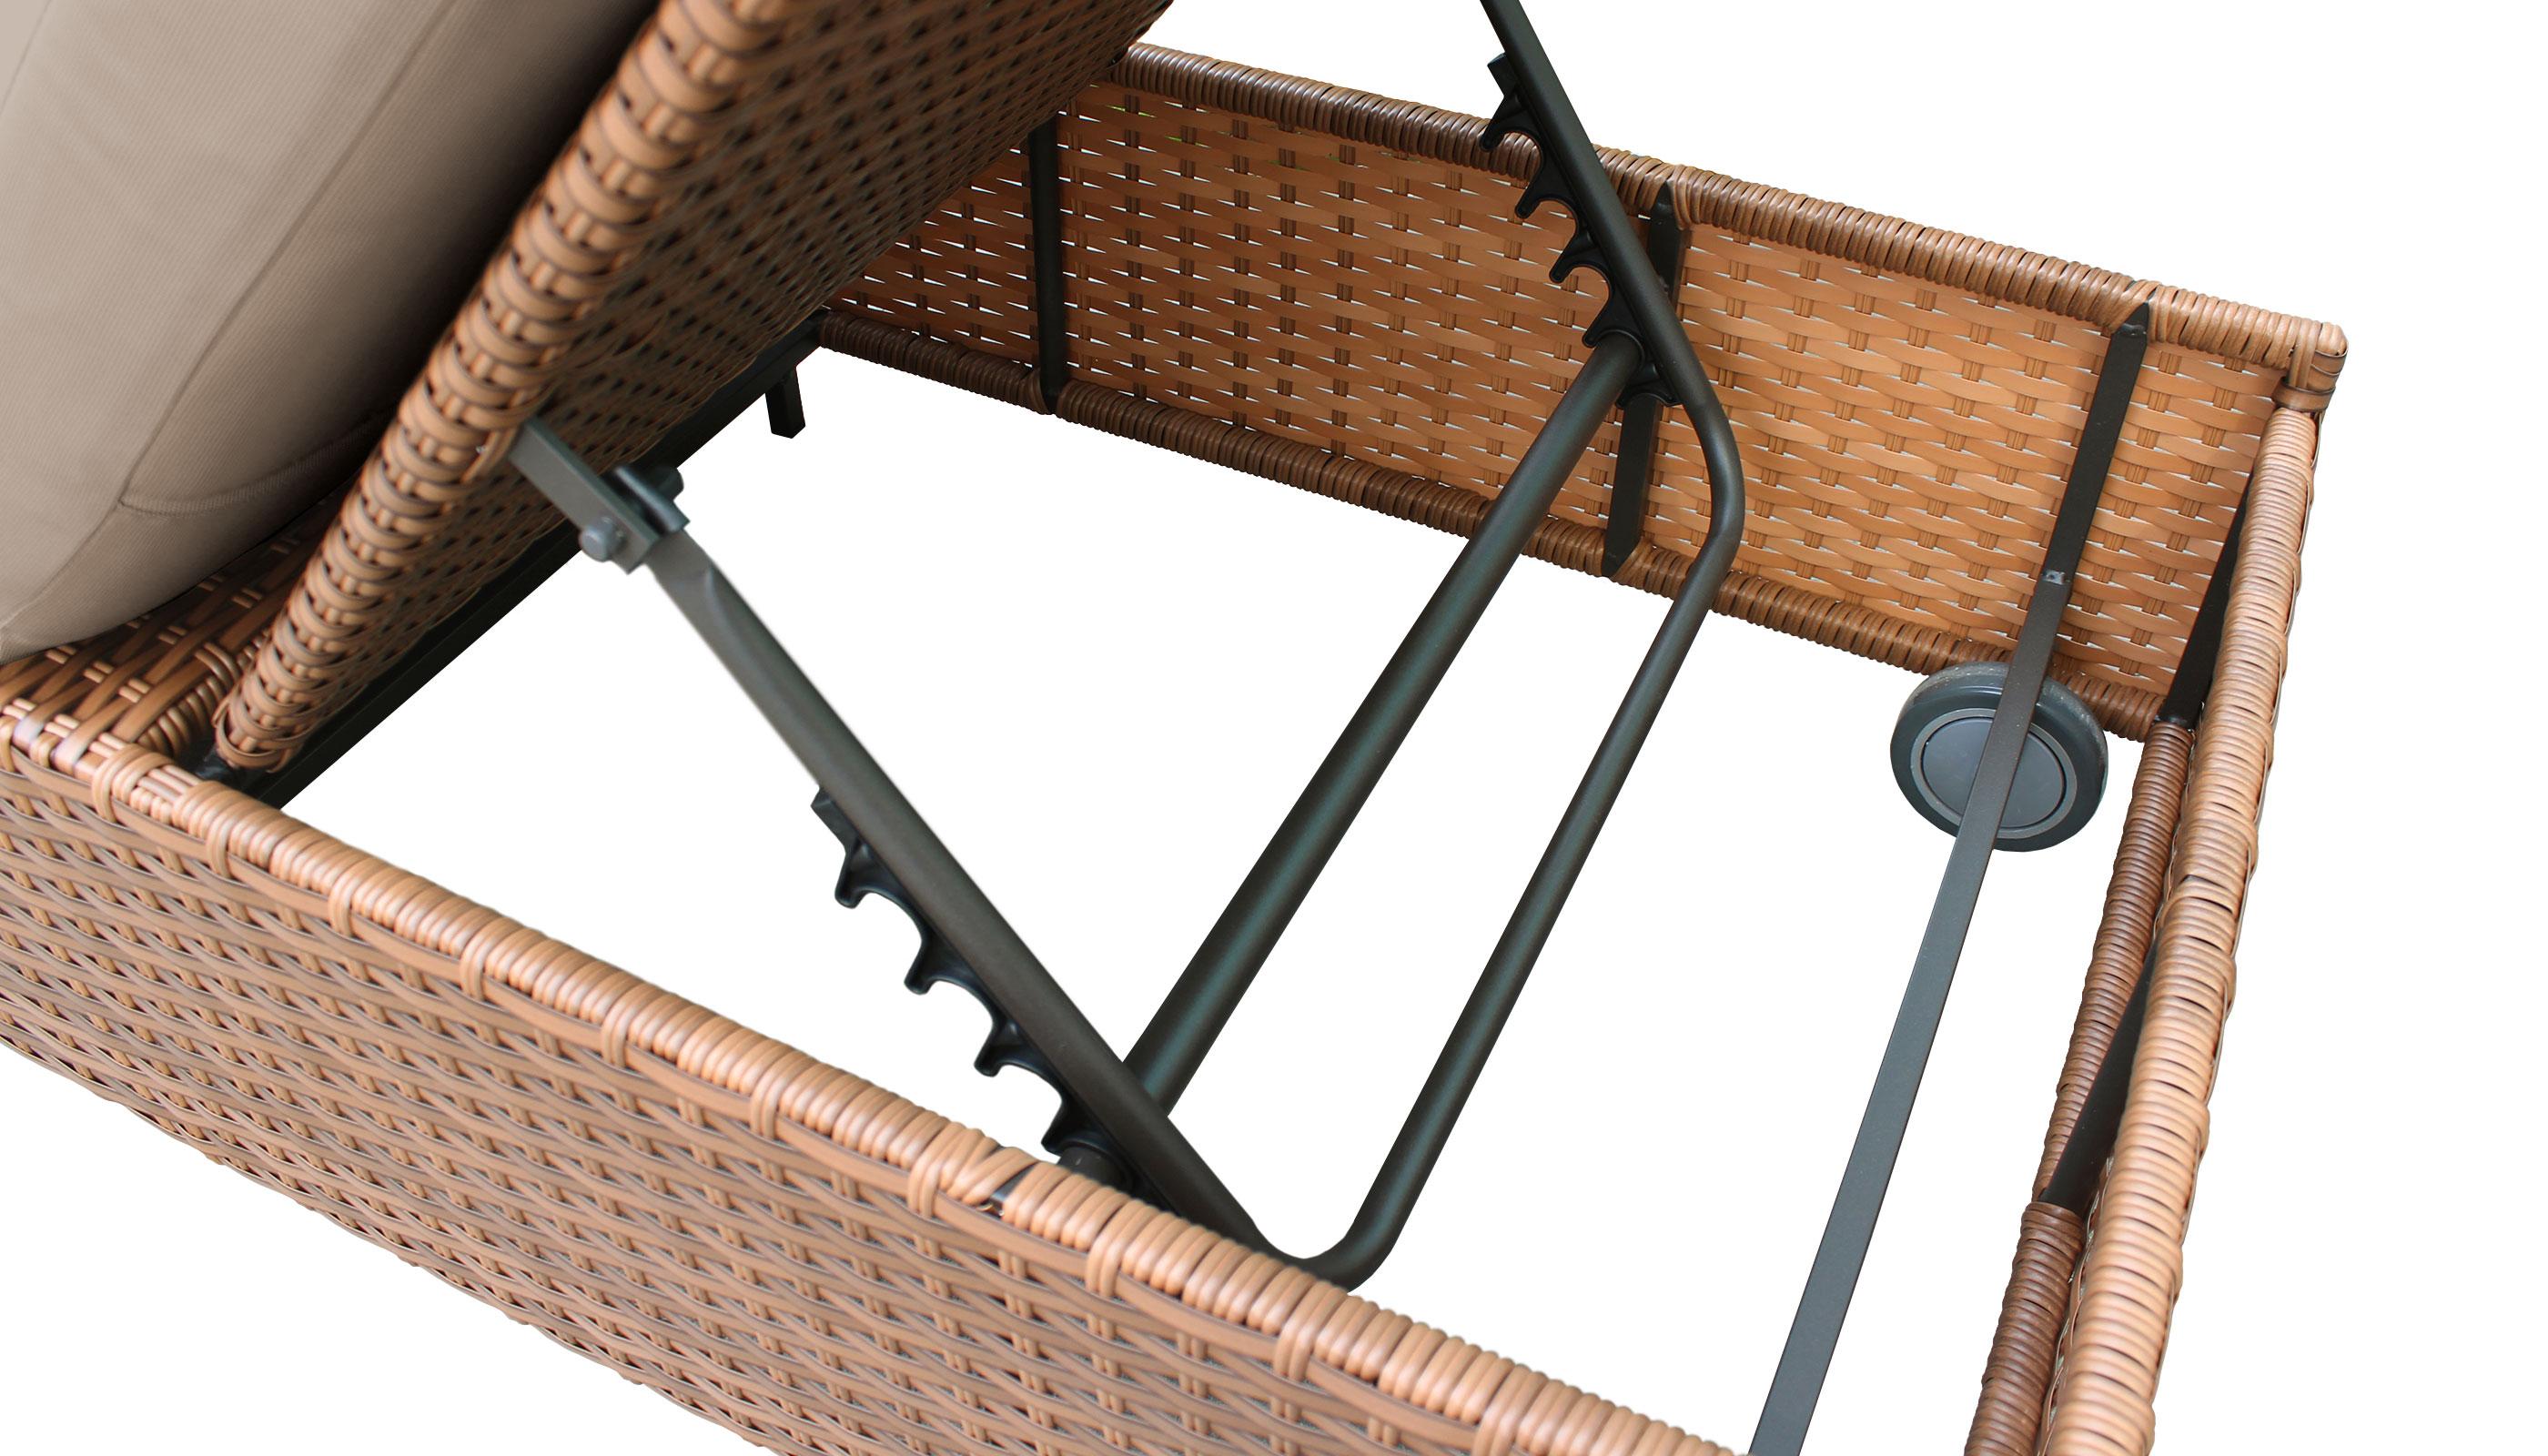 Laguna Wheeled Chaise Set of 2 Outdoor Wicker Patio Furniture - TK Classics